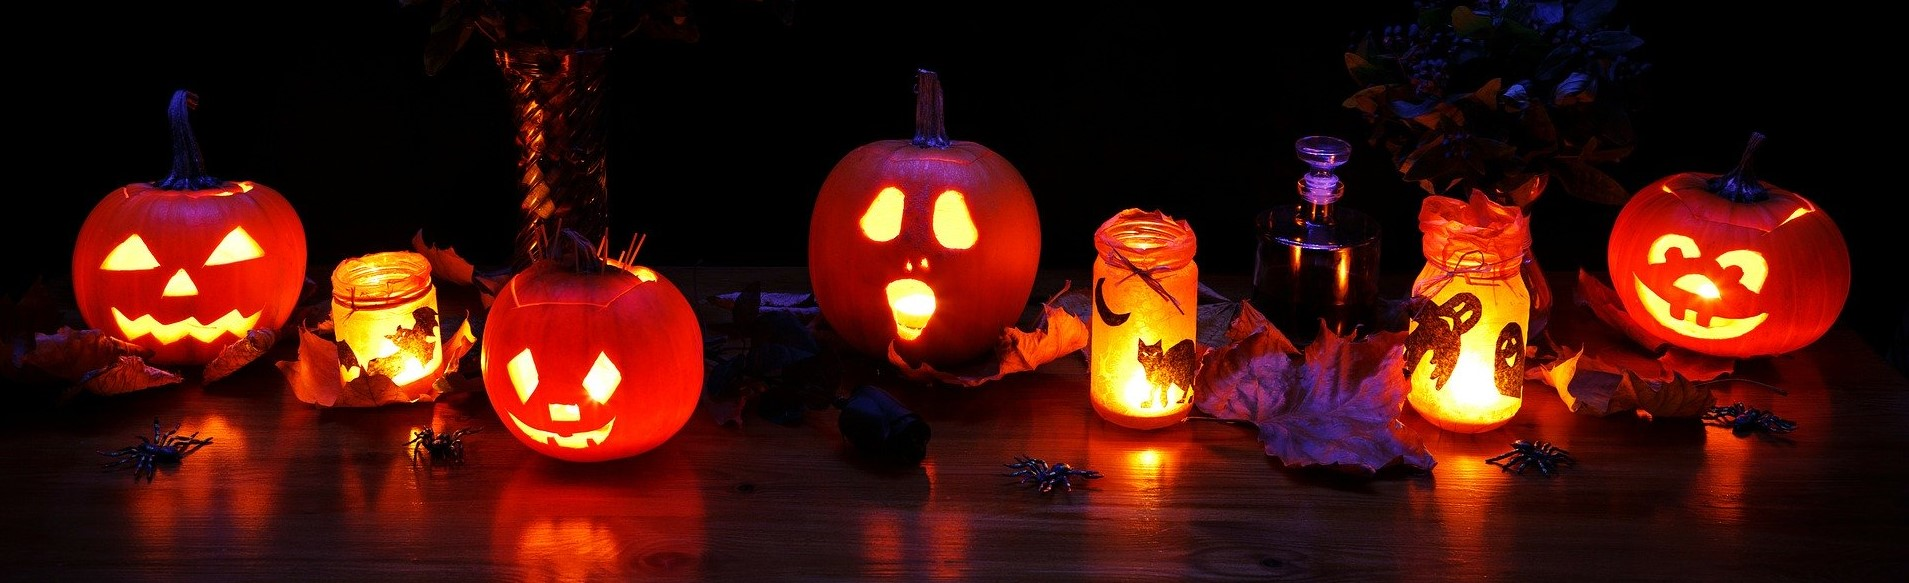 Halloween Radio 2020 Celebrate Halloween 2020 with the City of Greensboro | City News